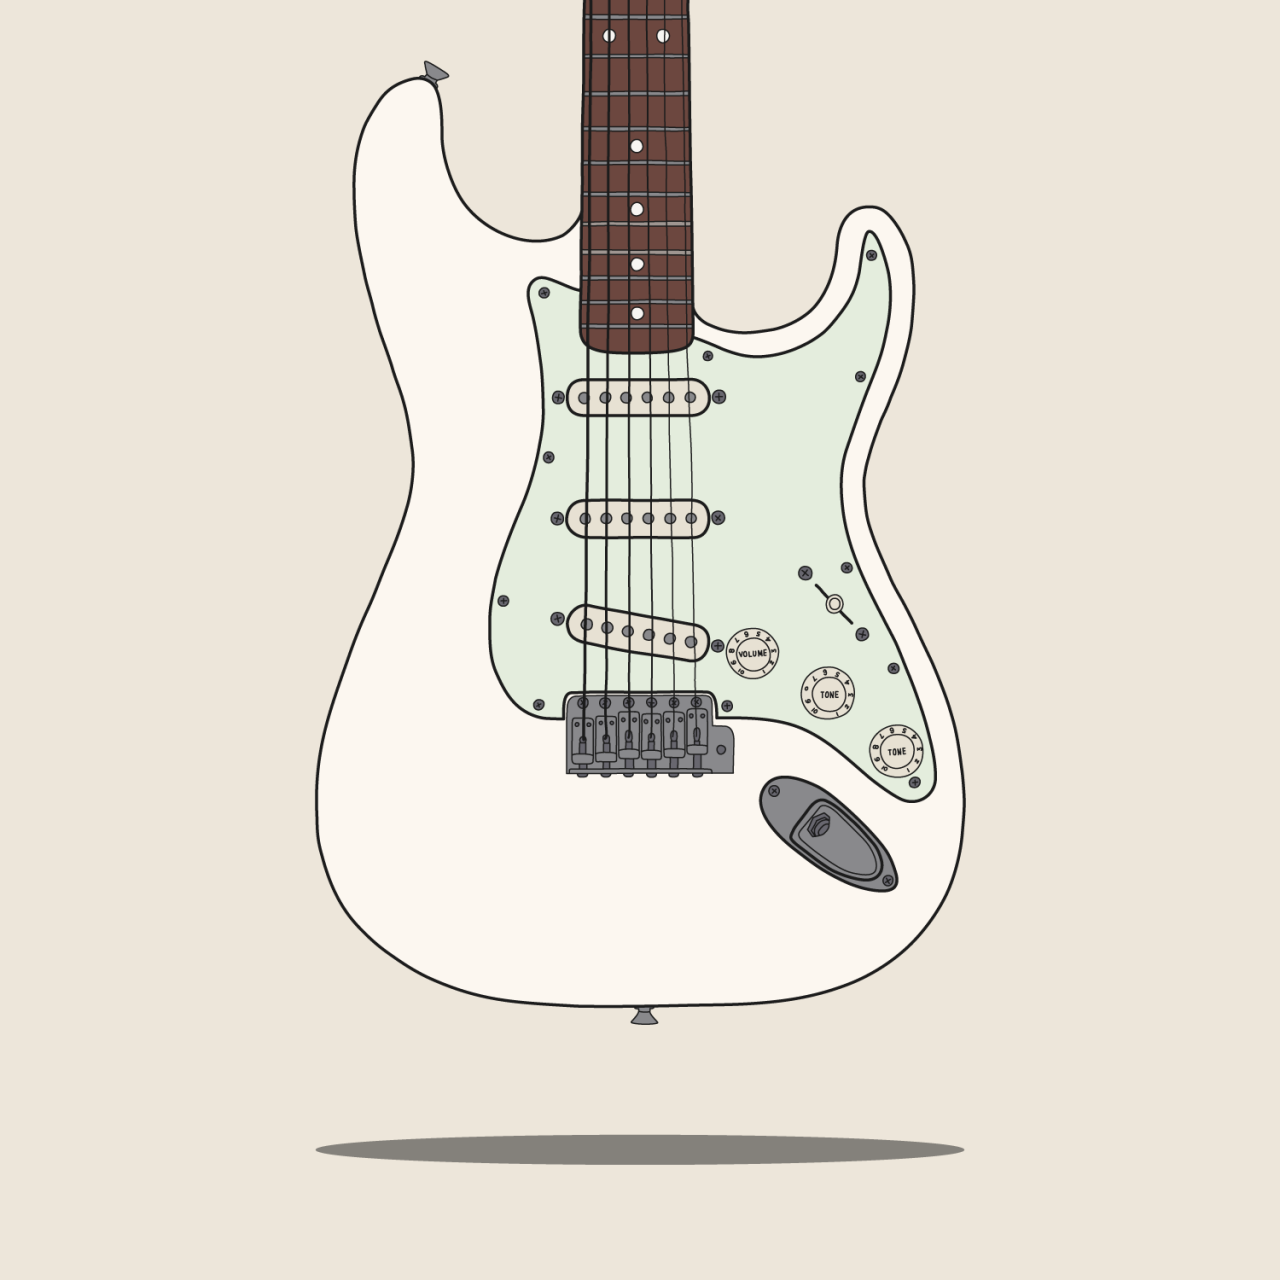 Fender American Standard Stratocaster Hss Shawbucker Lane Music Fender American Standard American Standard Stratocaster Fender